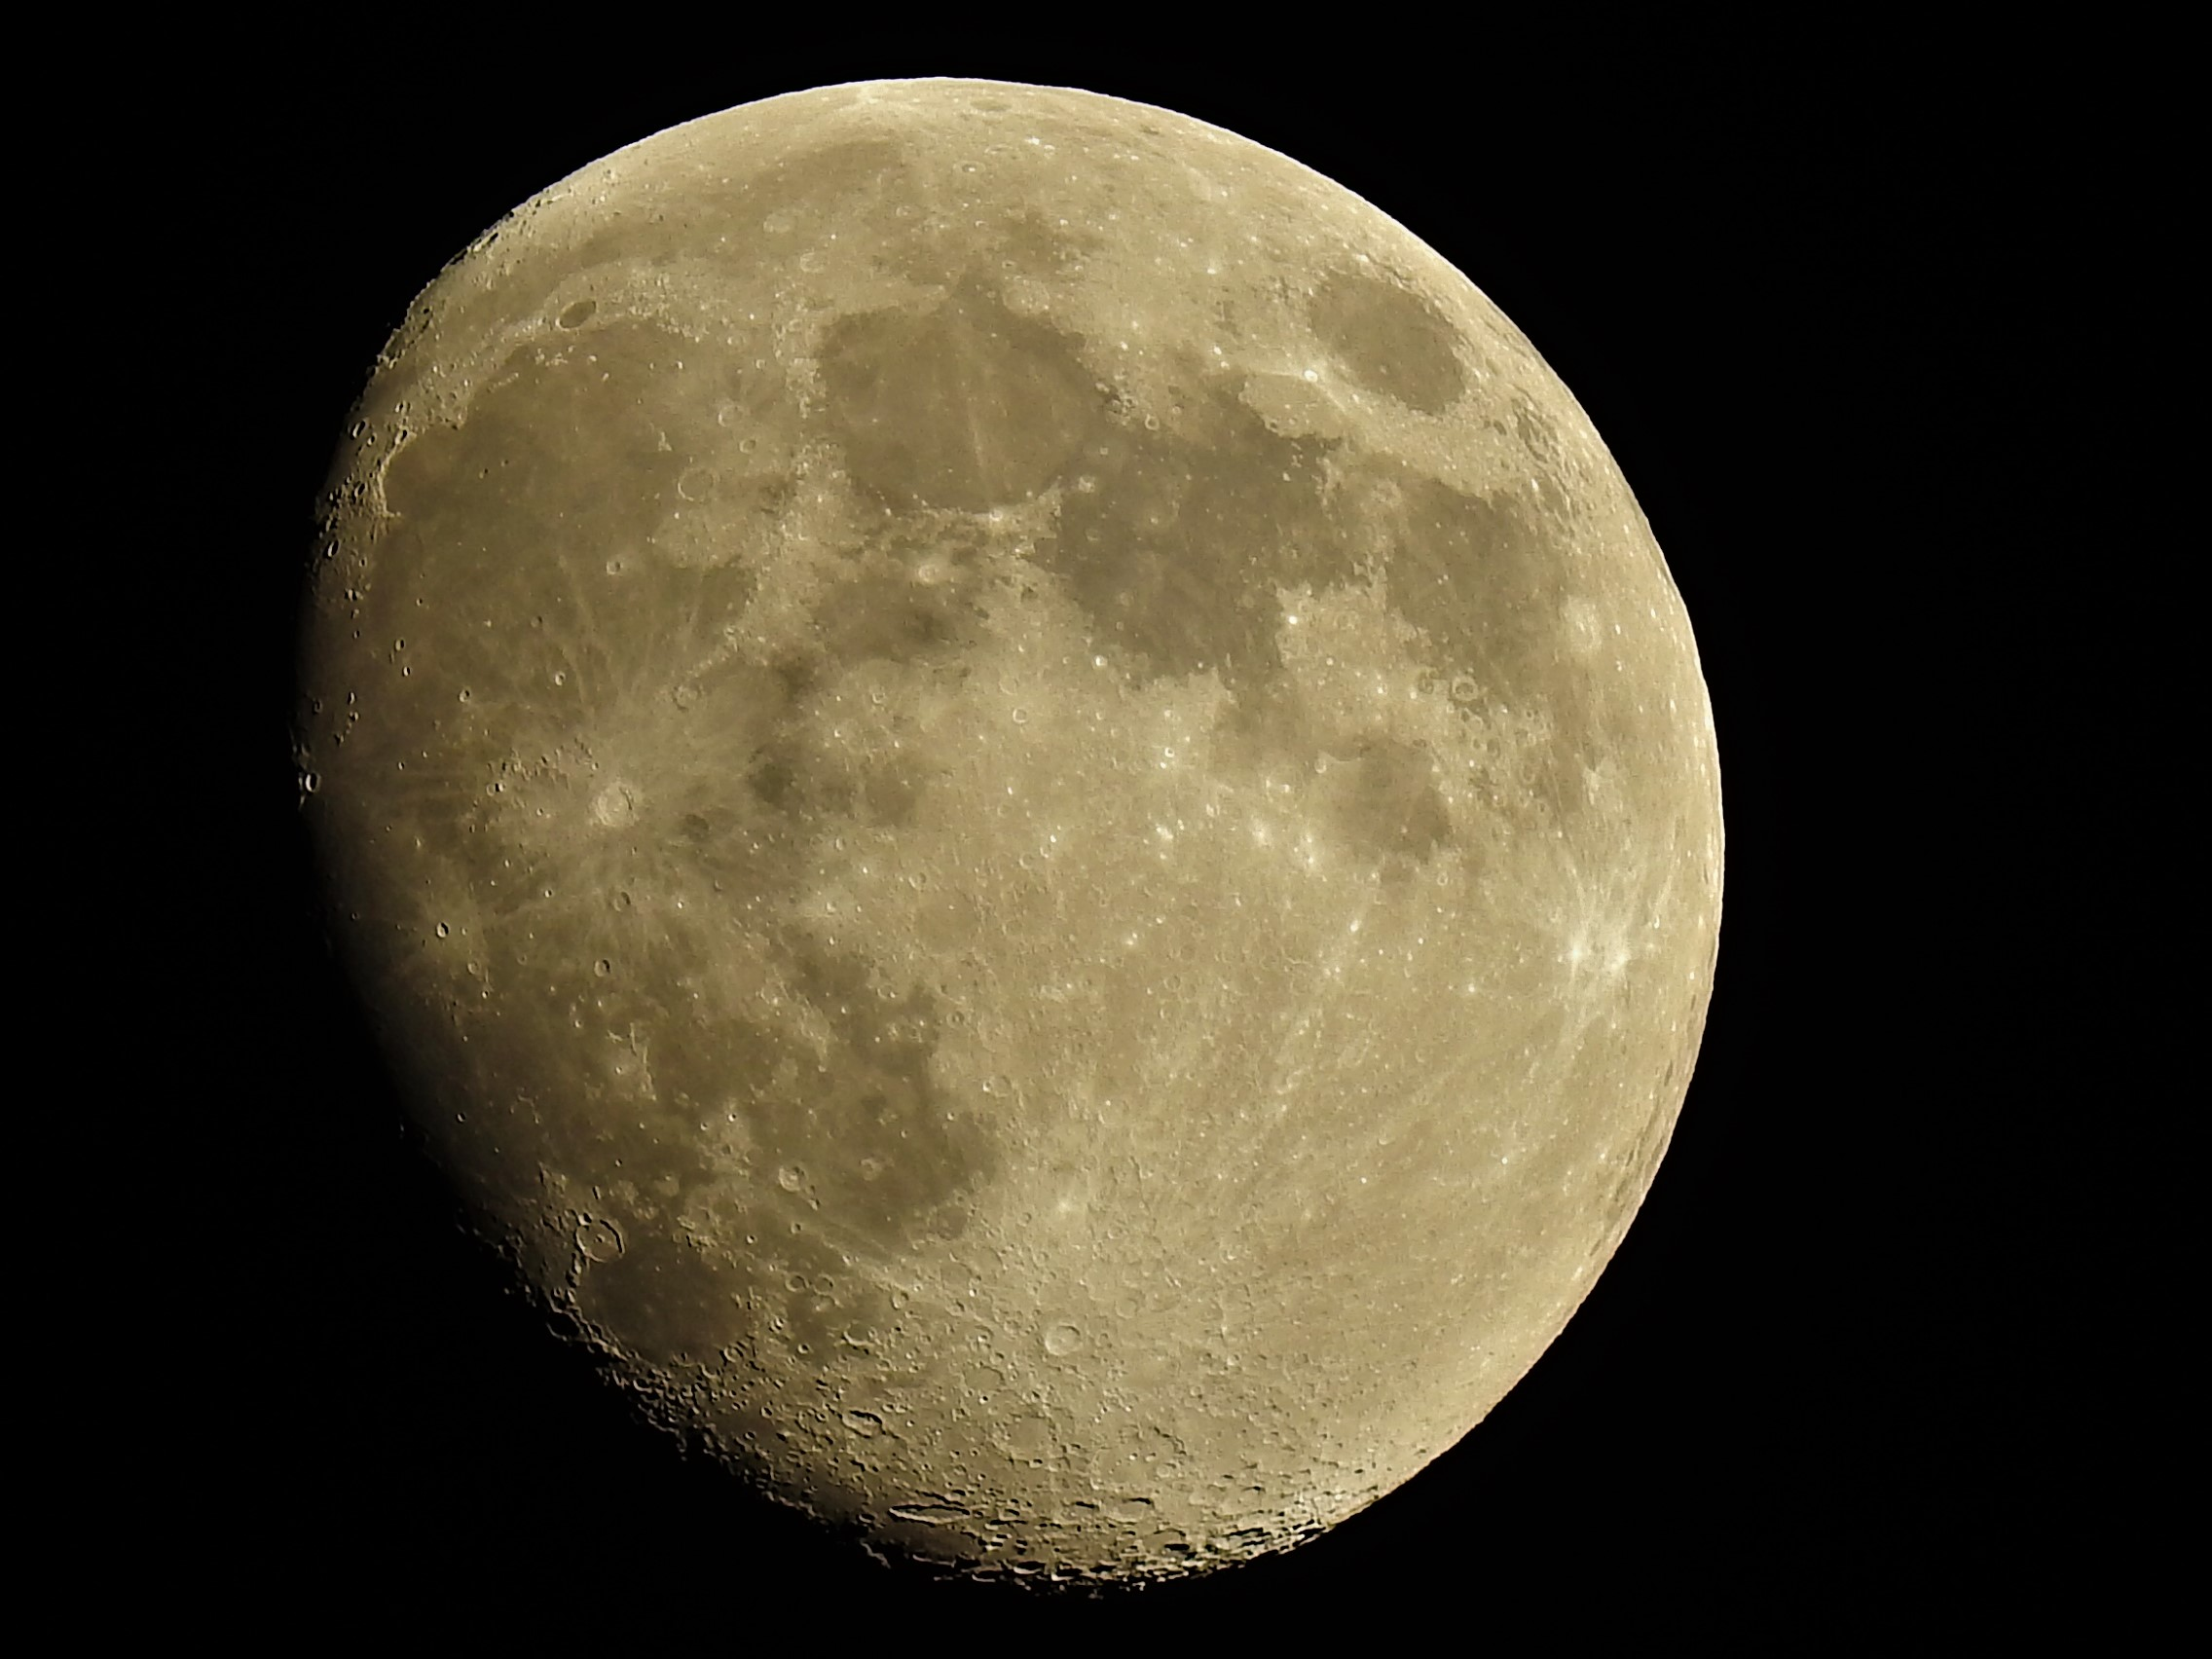 La Luna Hoy (02/06/2020)